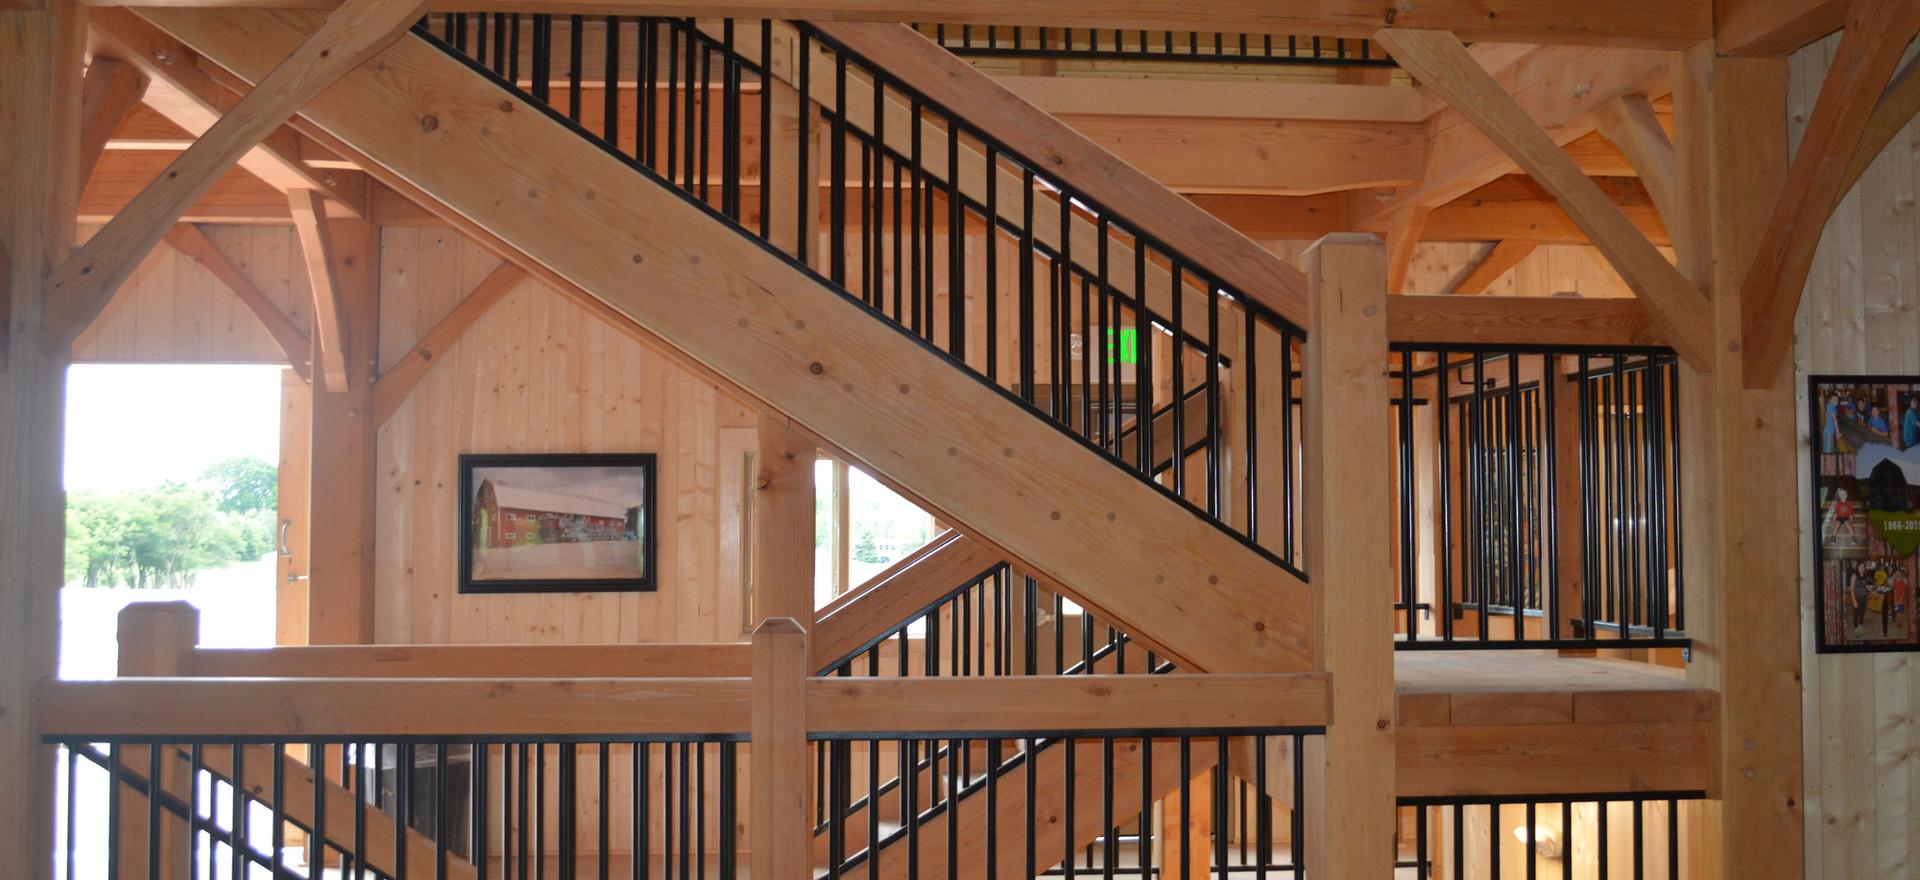 Wooden Construction